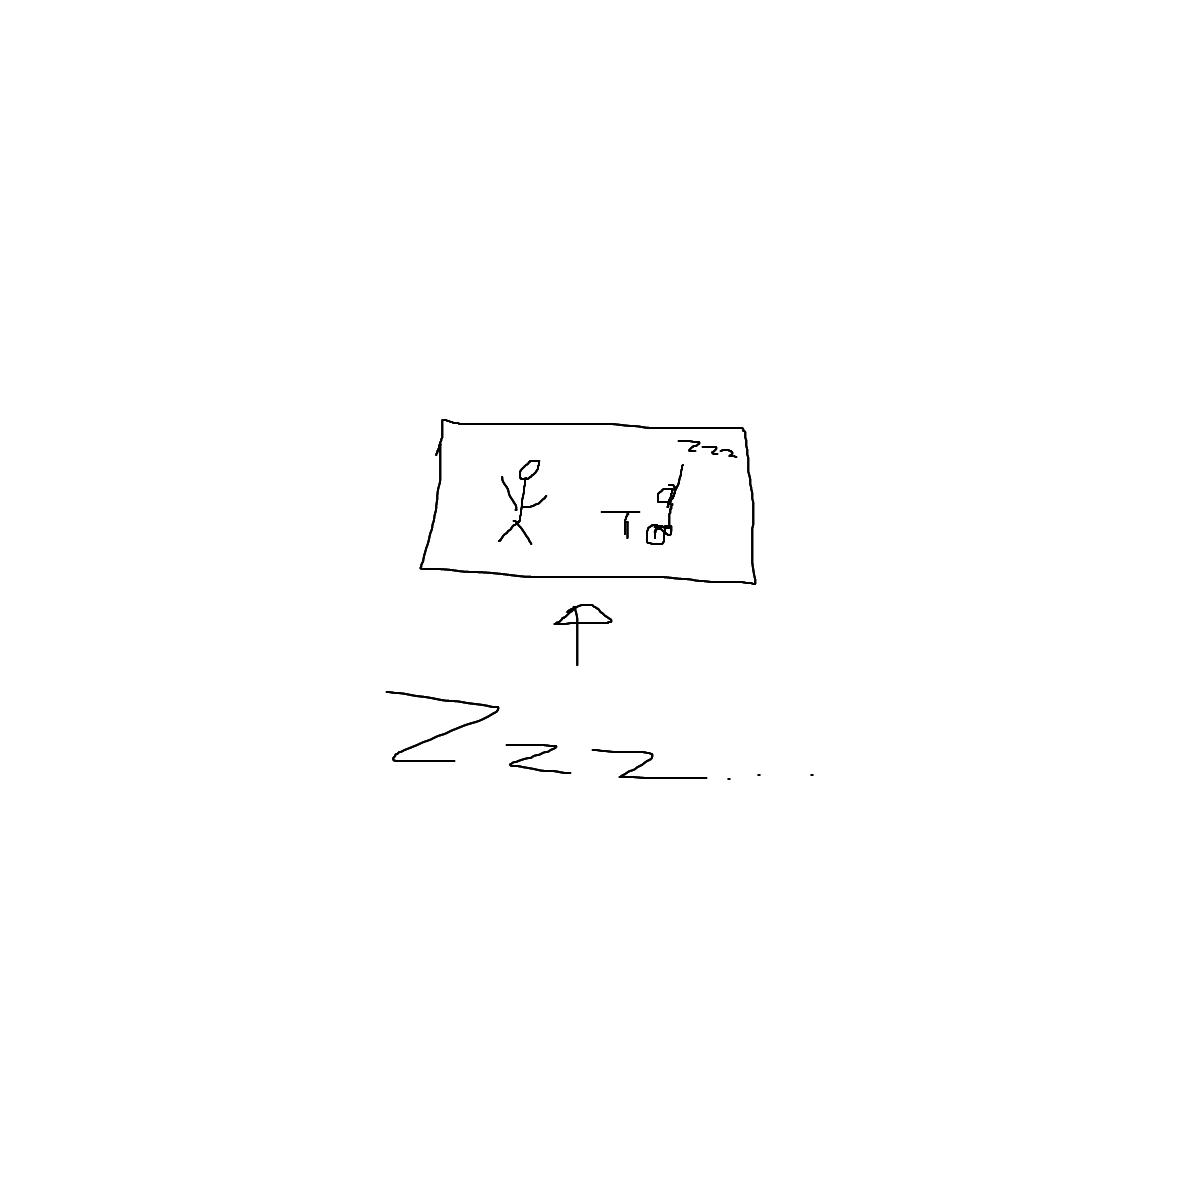 BAAAM drawing#8201 lat:46.9546775817871100lng: 7.4447689056396480